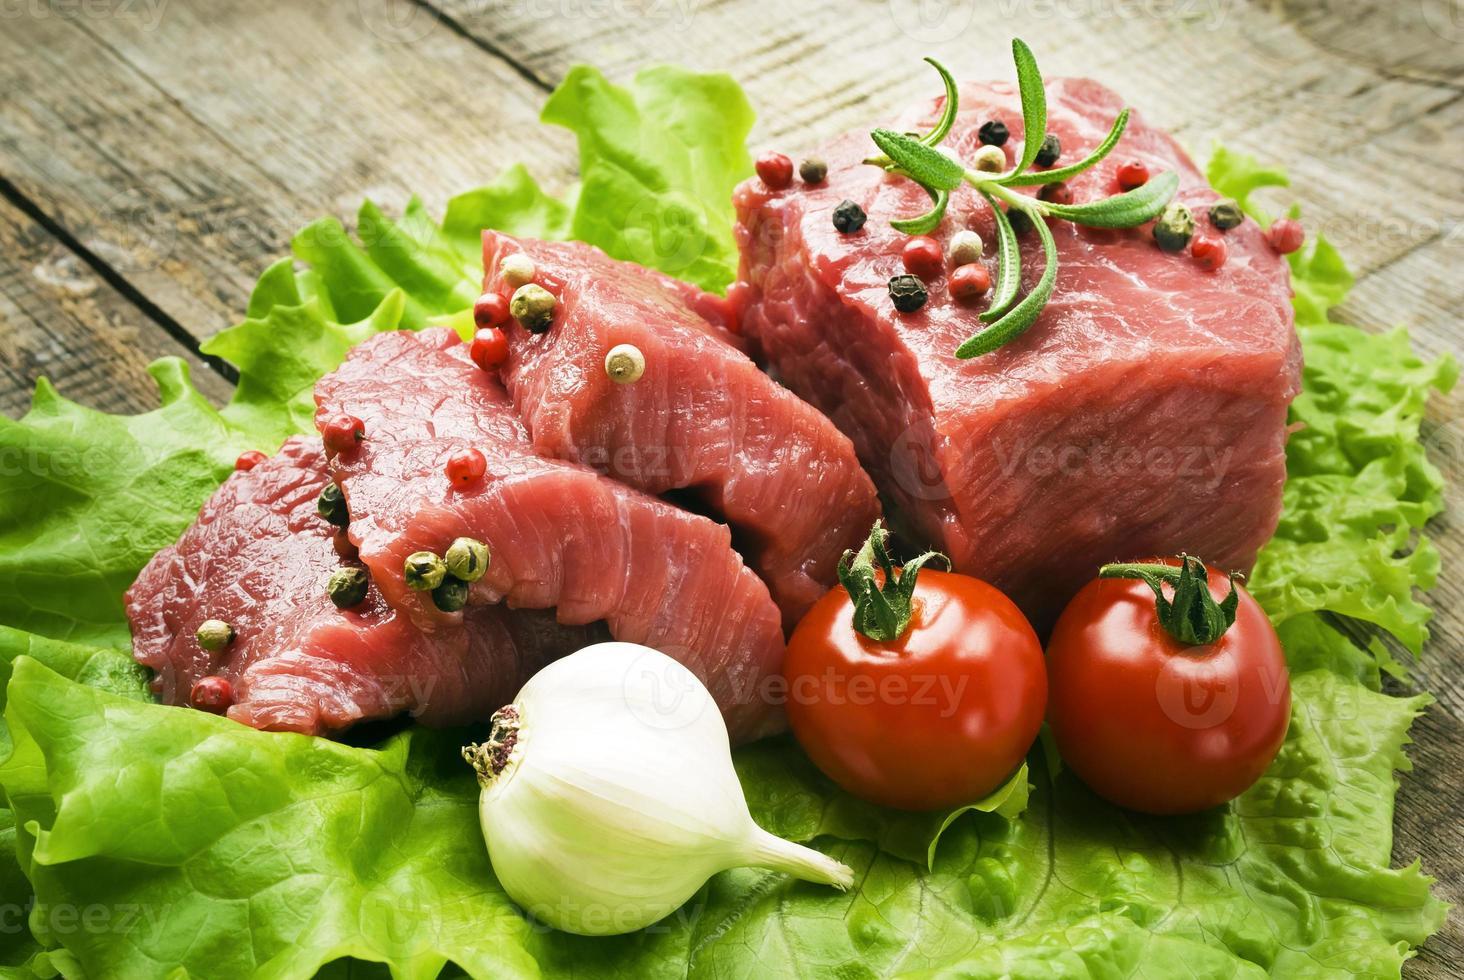 rohes Steak mit grünem Salat auf Holzbrett foto